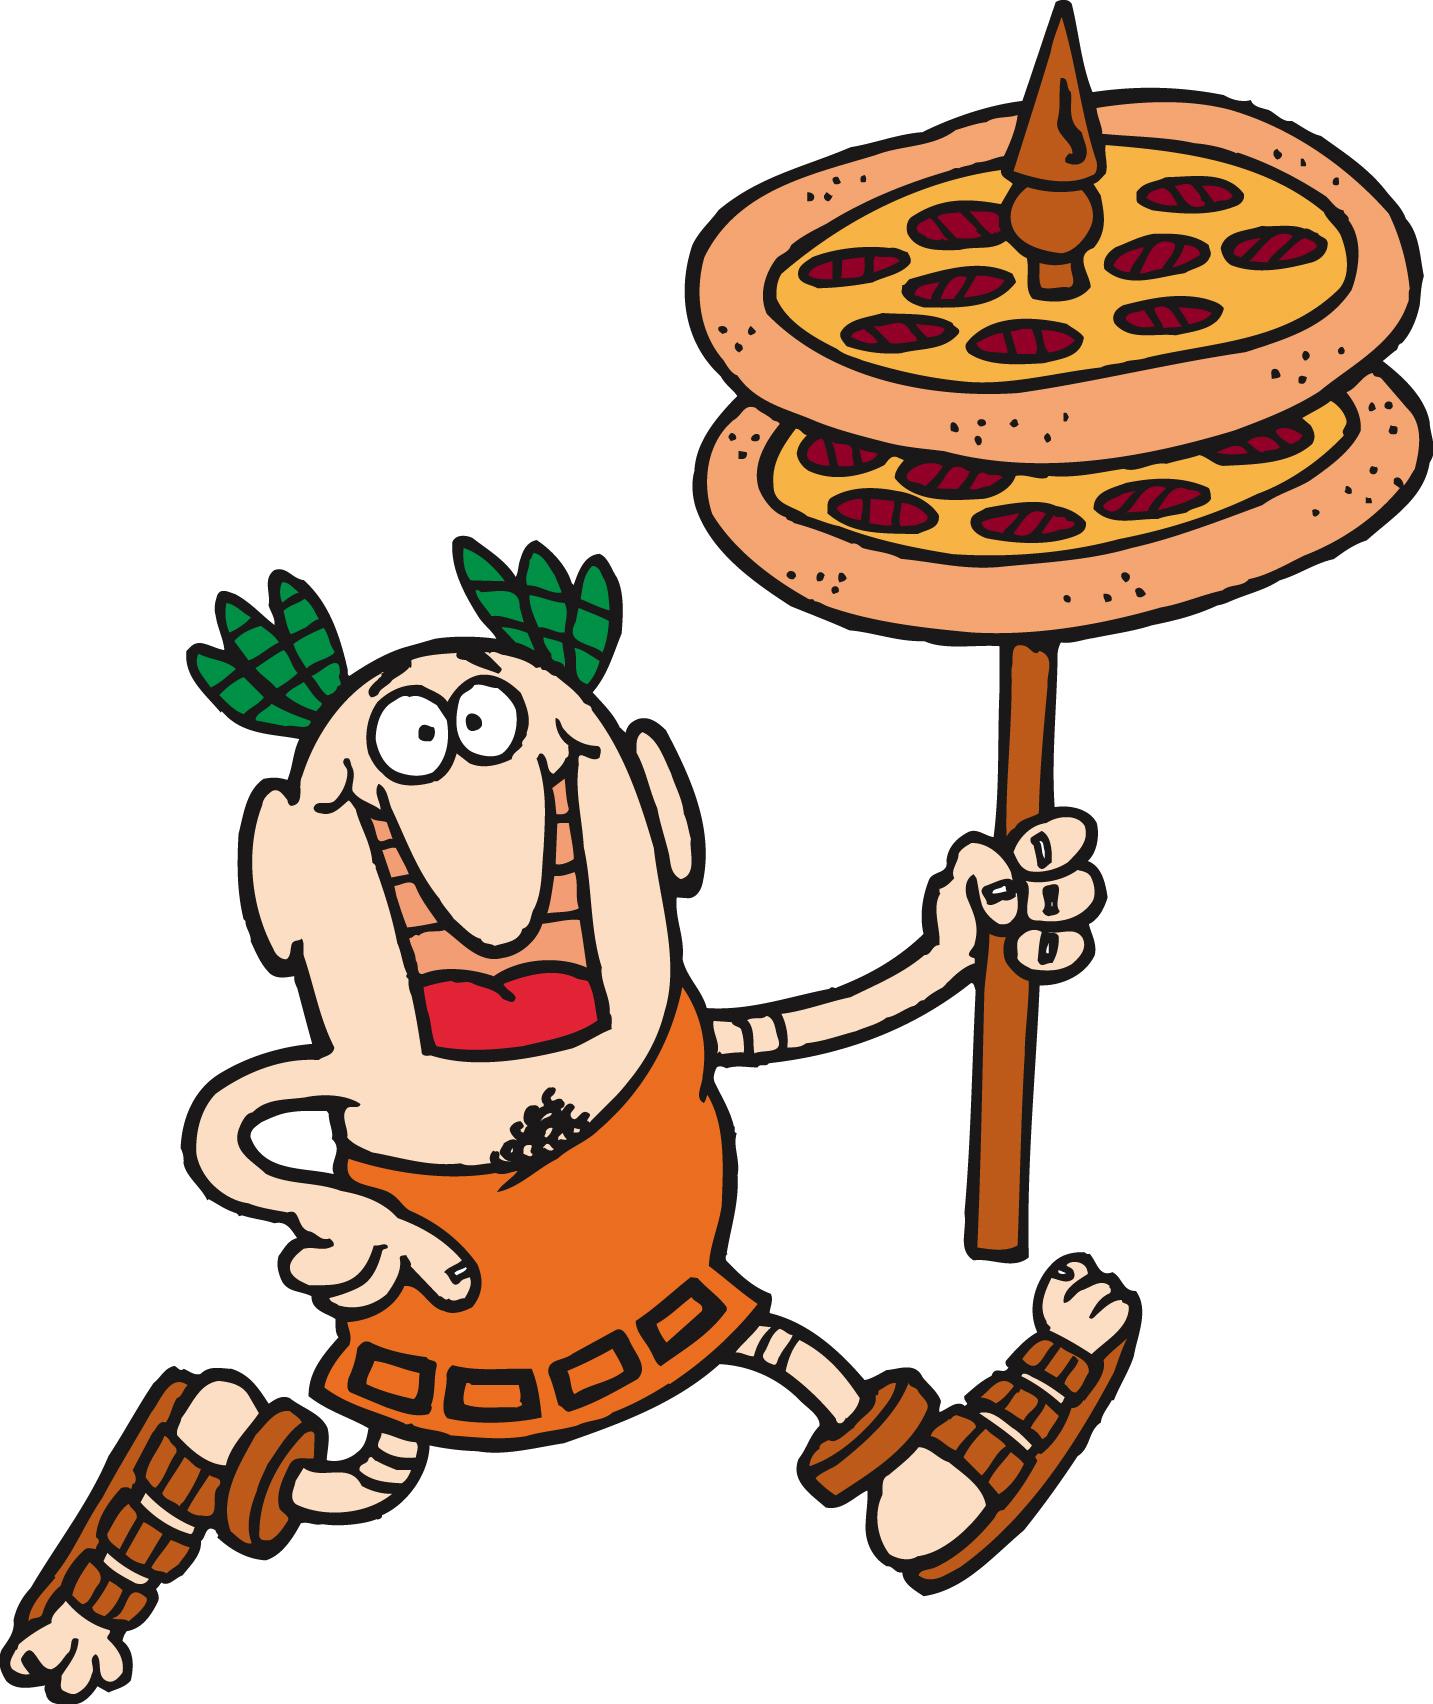 Pizza Sales | Stoughton Youth Hockey Association